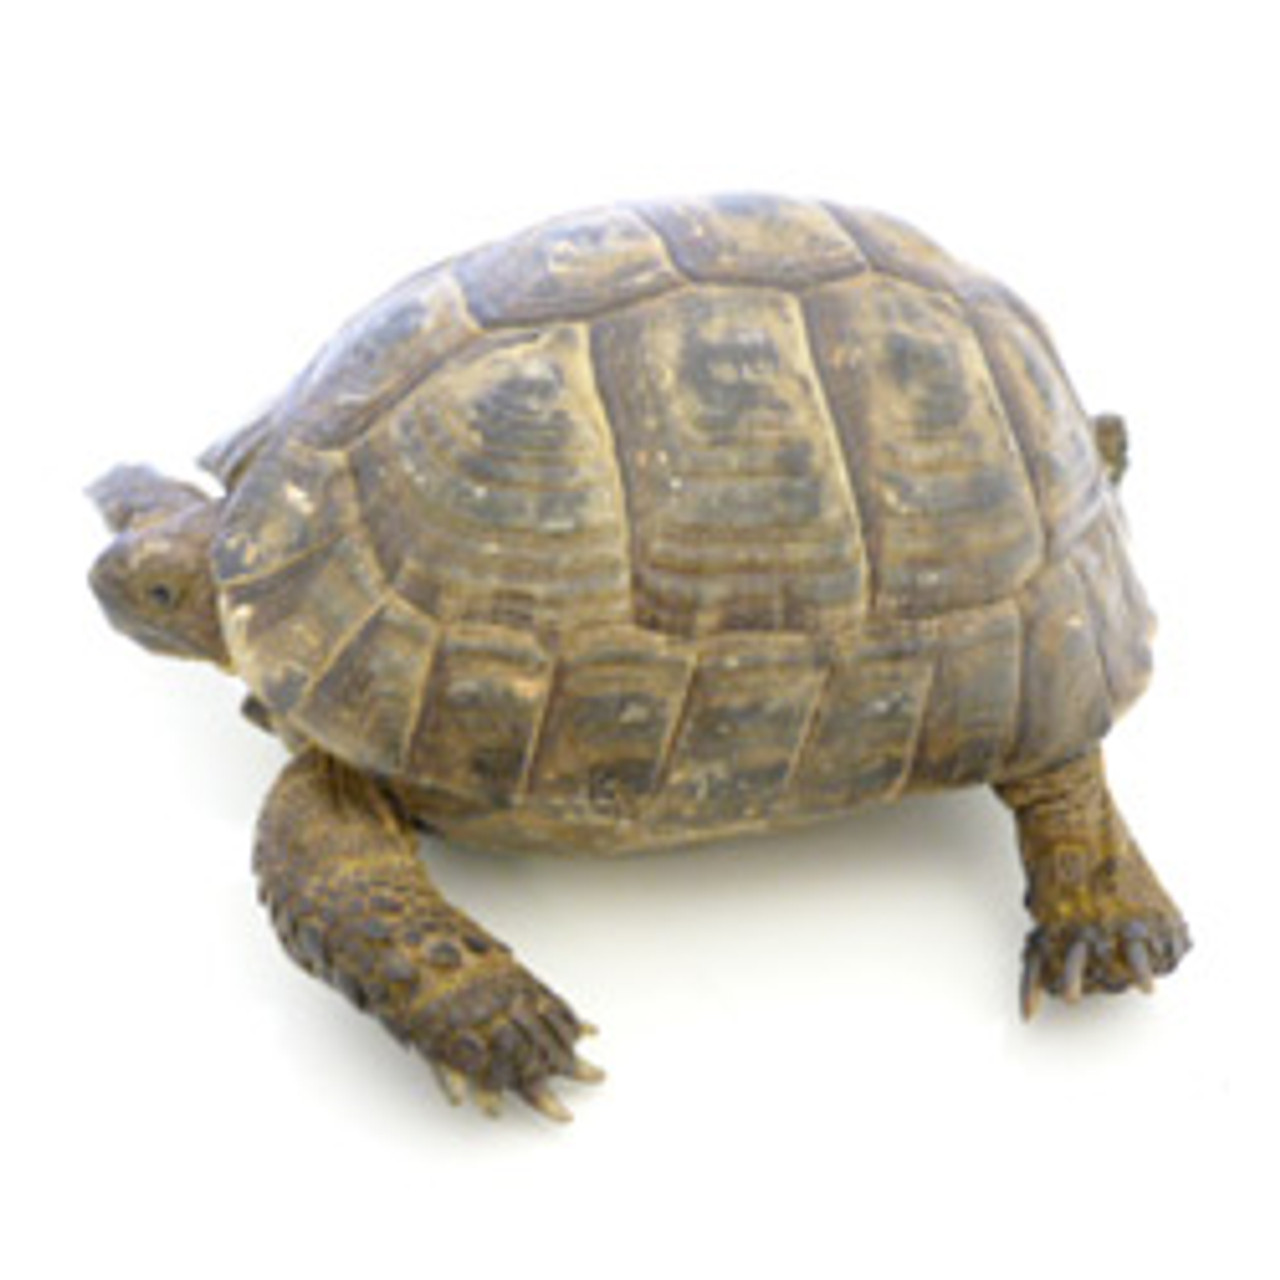 Black Greek Tortoise (Testudo graeca)